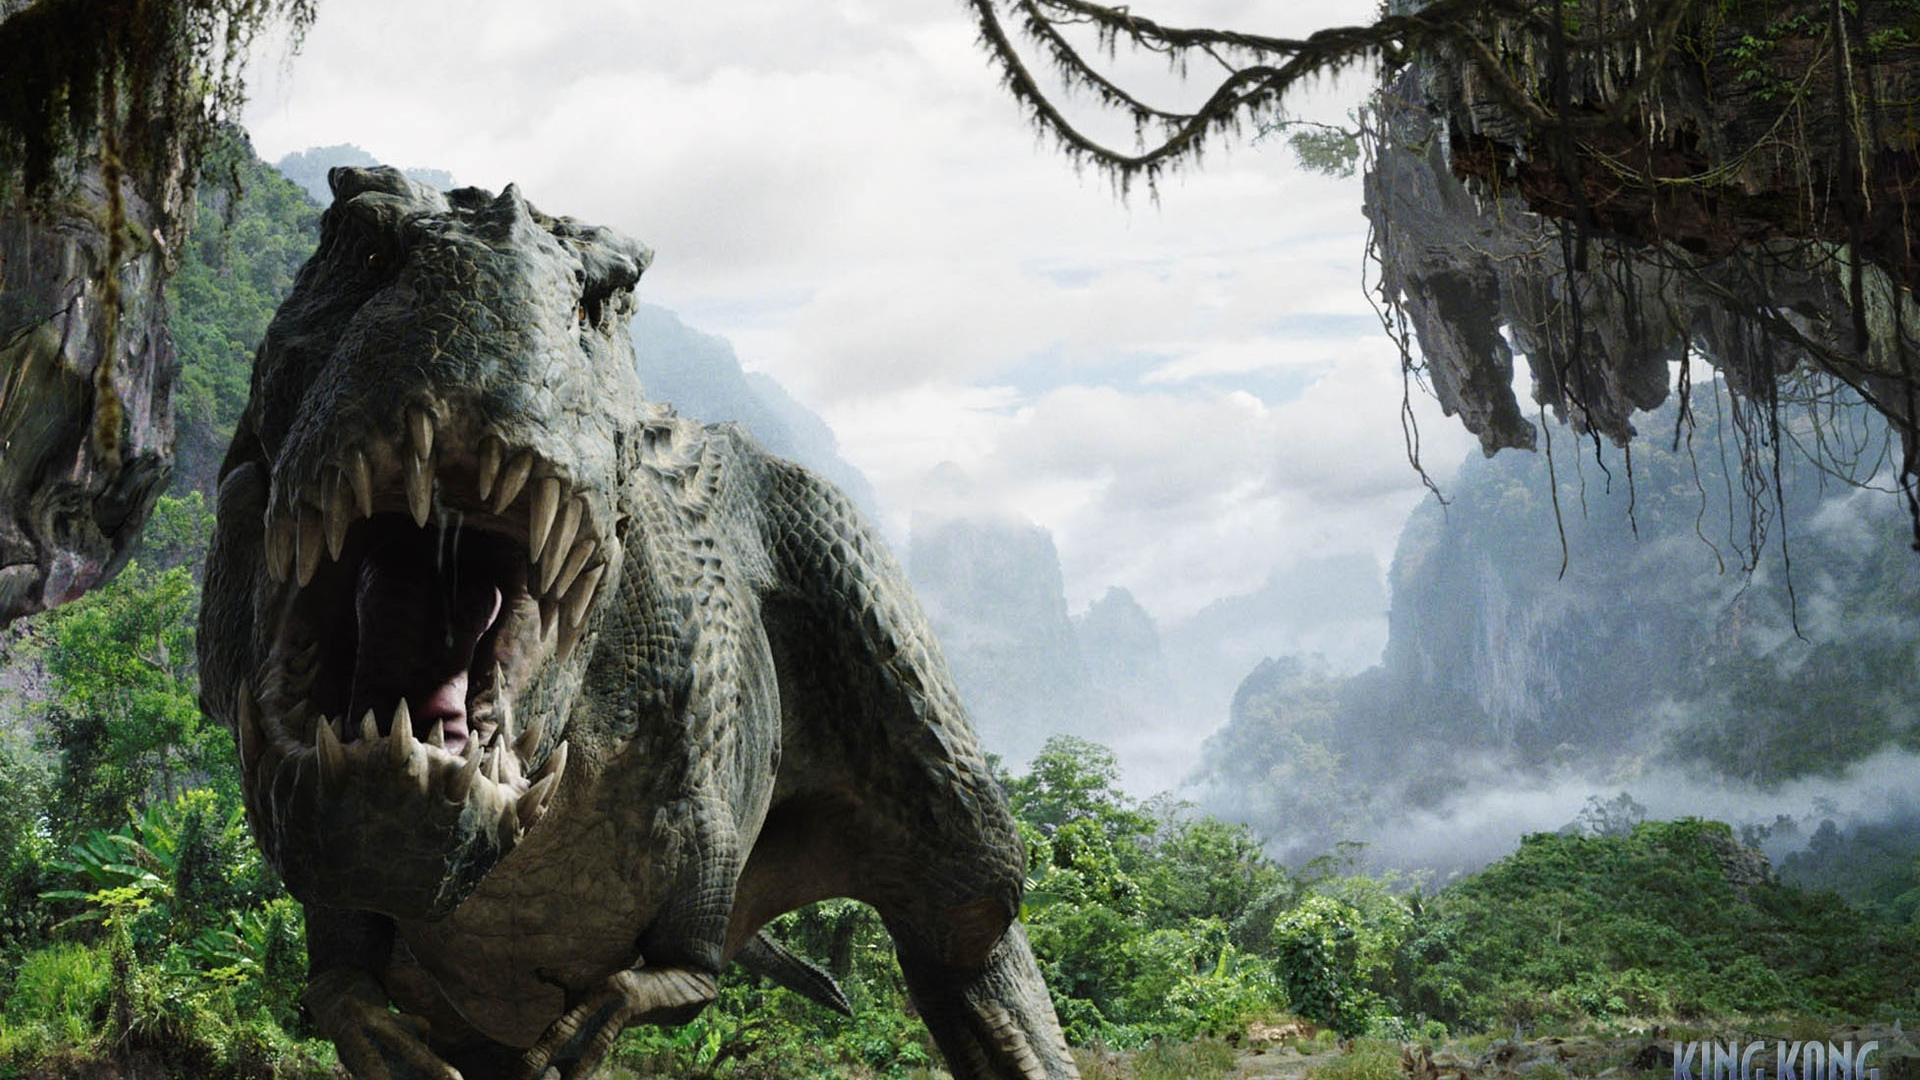 sketch-king-kong-dinosaur-p-hd-wallszone-1337371.jpg